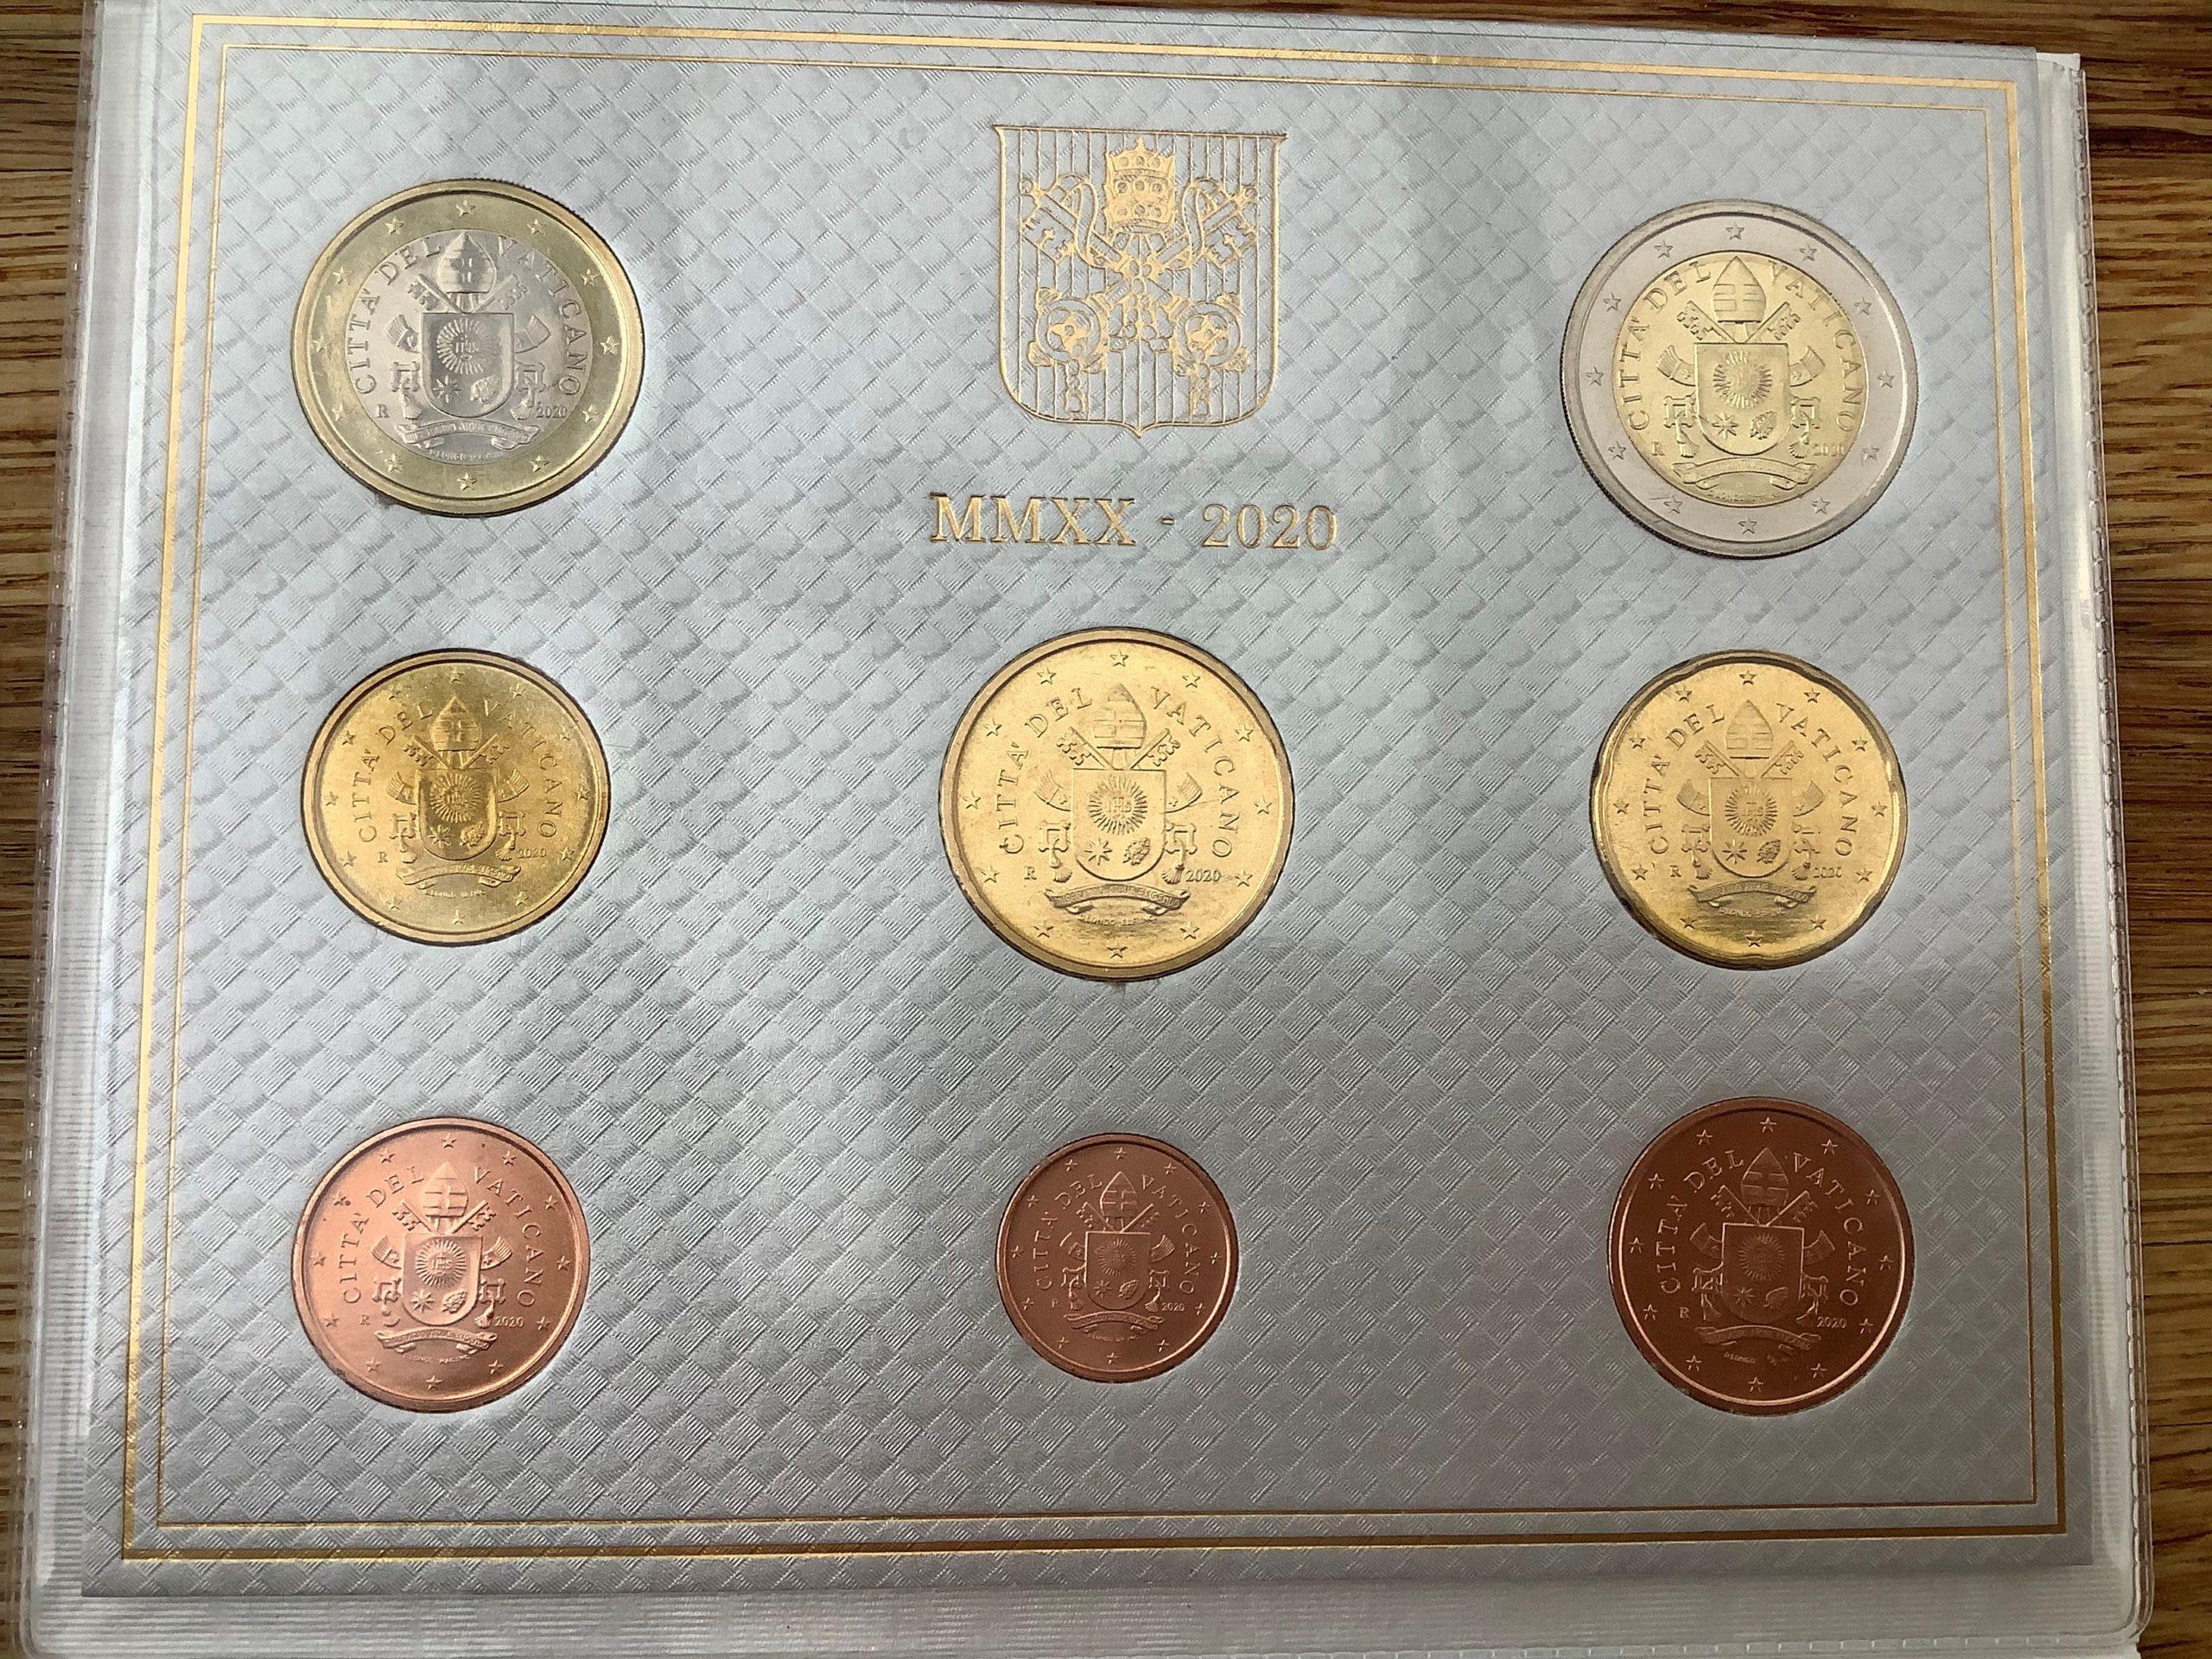 Seltene Vaticanmünzen